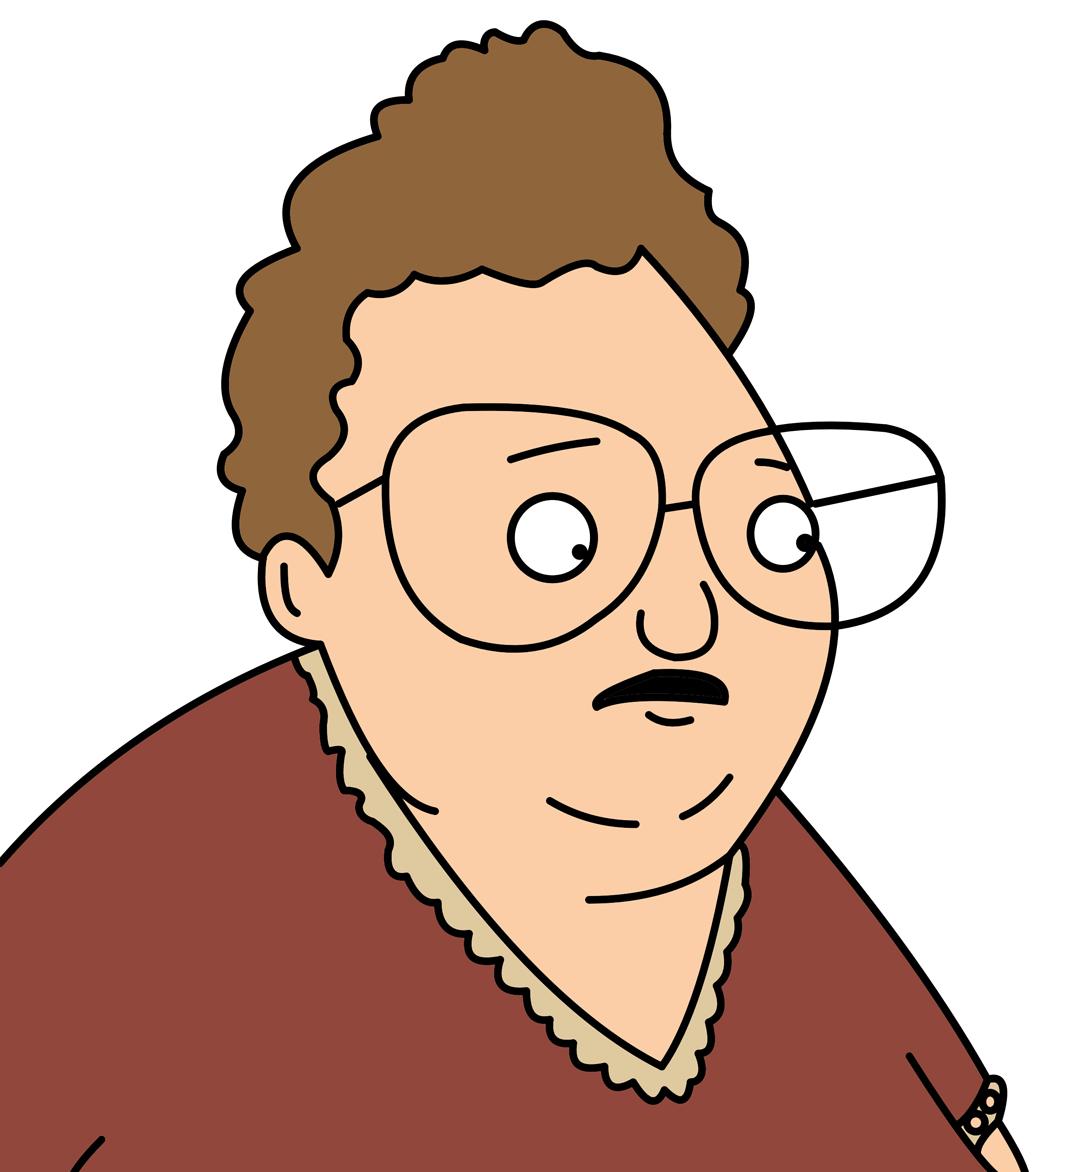 Ms. LaBonz